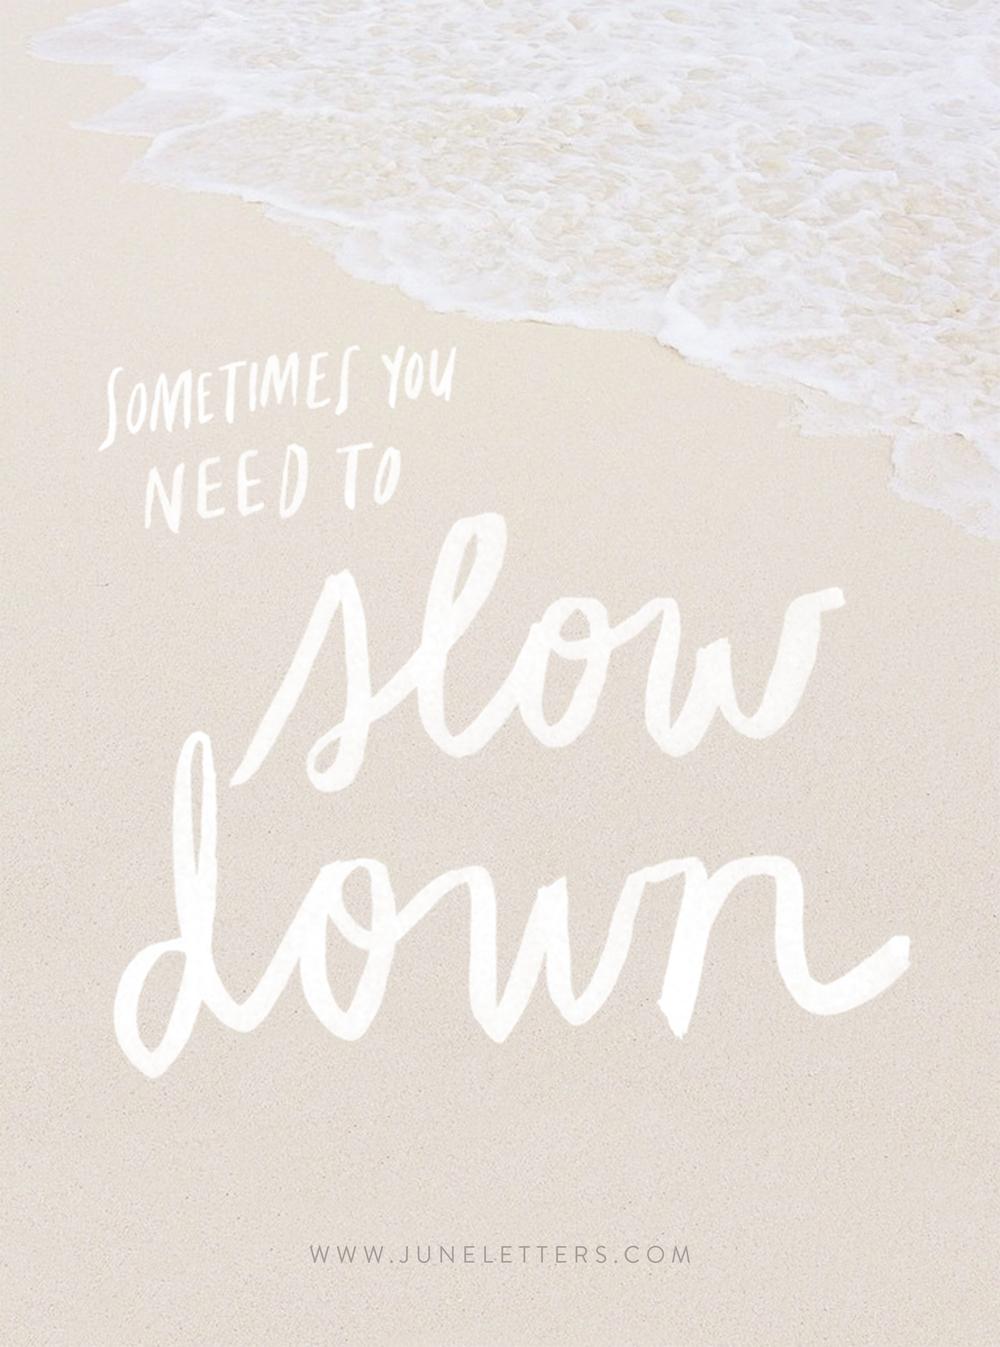 SlowDown-highres.jpg